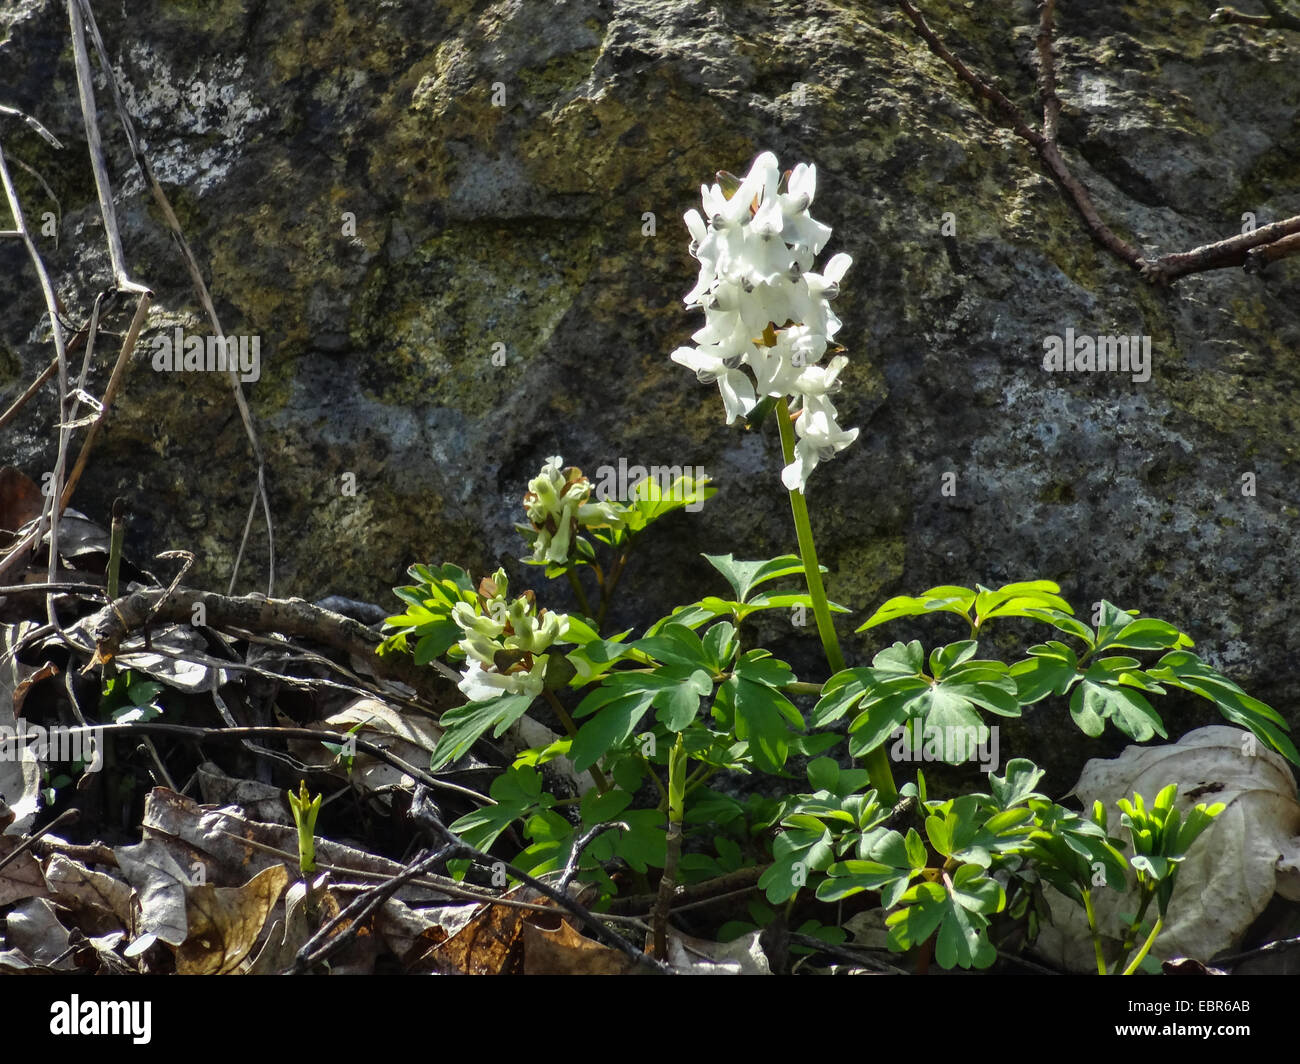 bulbous corydalis, fumewort (Corydalis cava), blooming in white, Germany, Hesse, Gudensberg - Stock Image